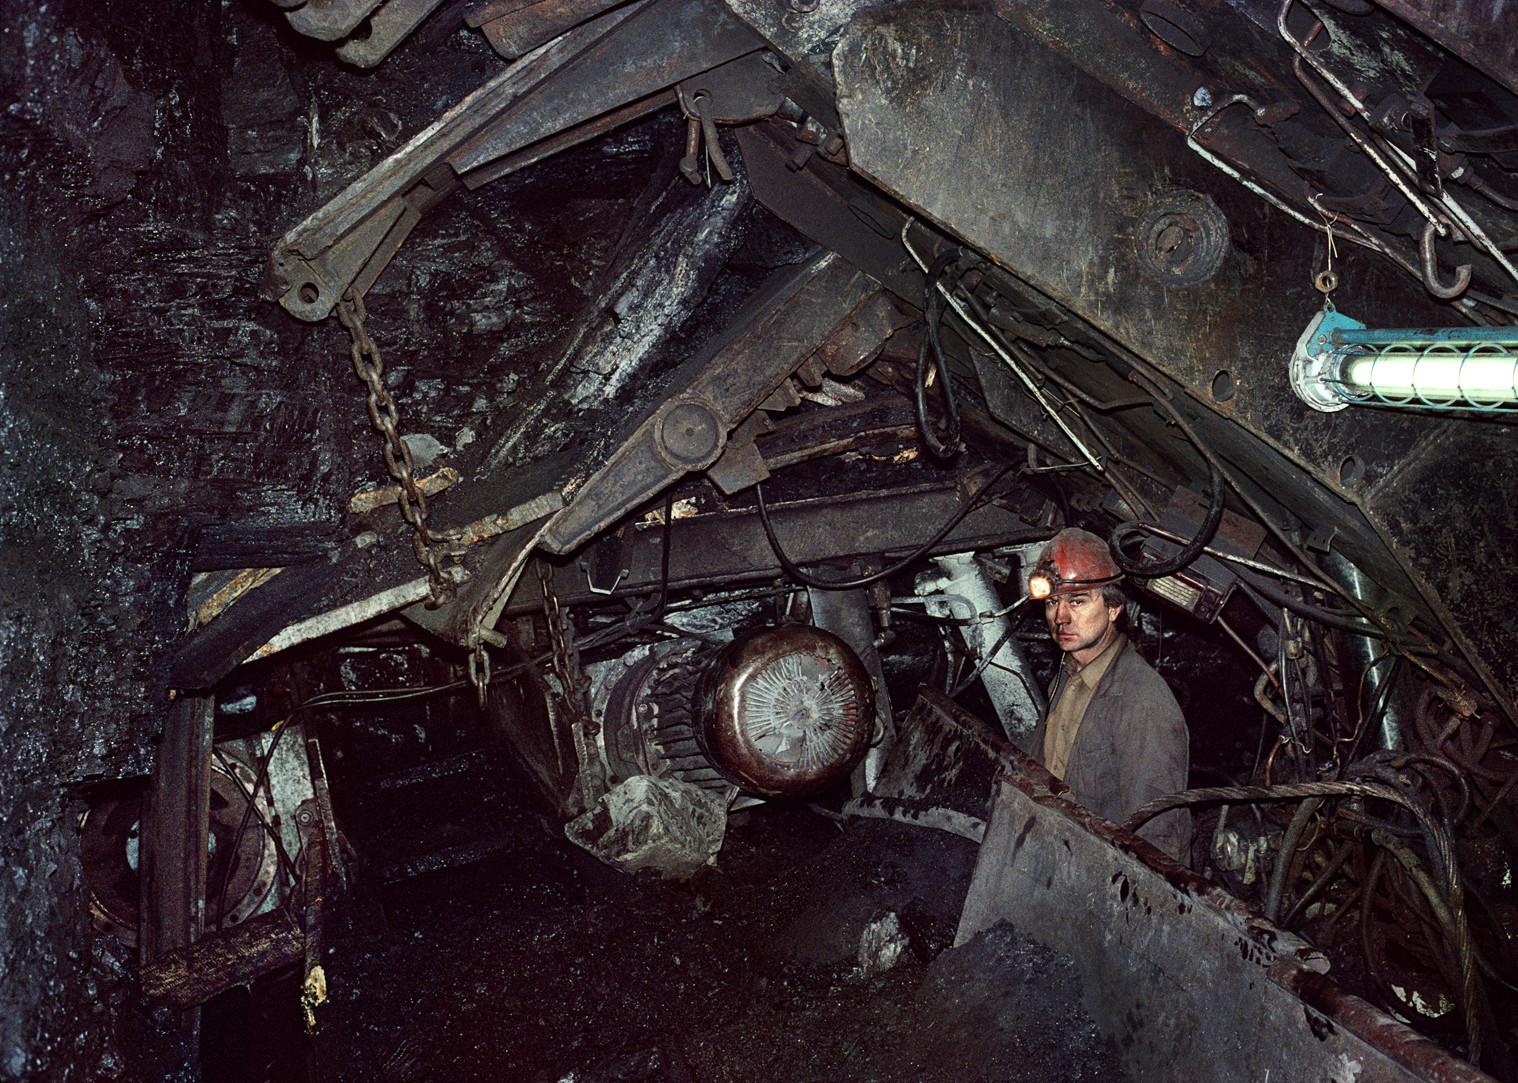 """Kemerovo, Soviet Russia, March 16, 1991,"" from Keizo Kitajima's Soviet Union photographs at Little Big Man Gallery."